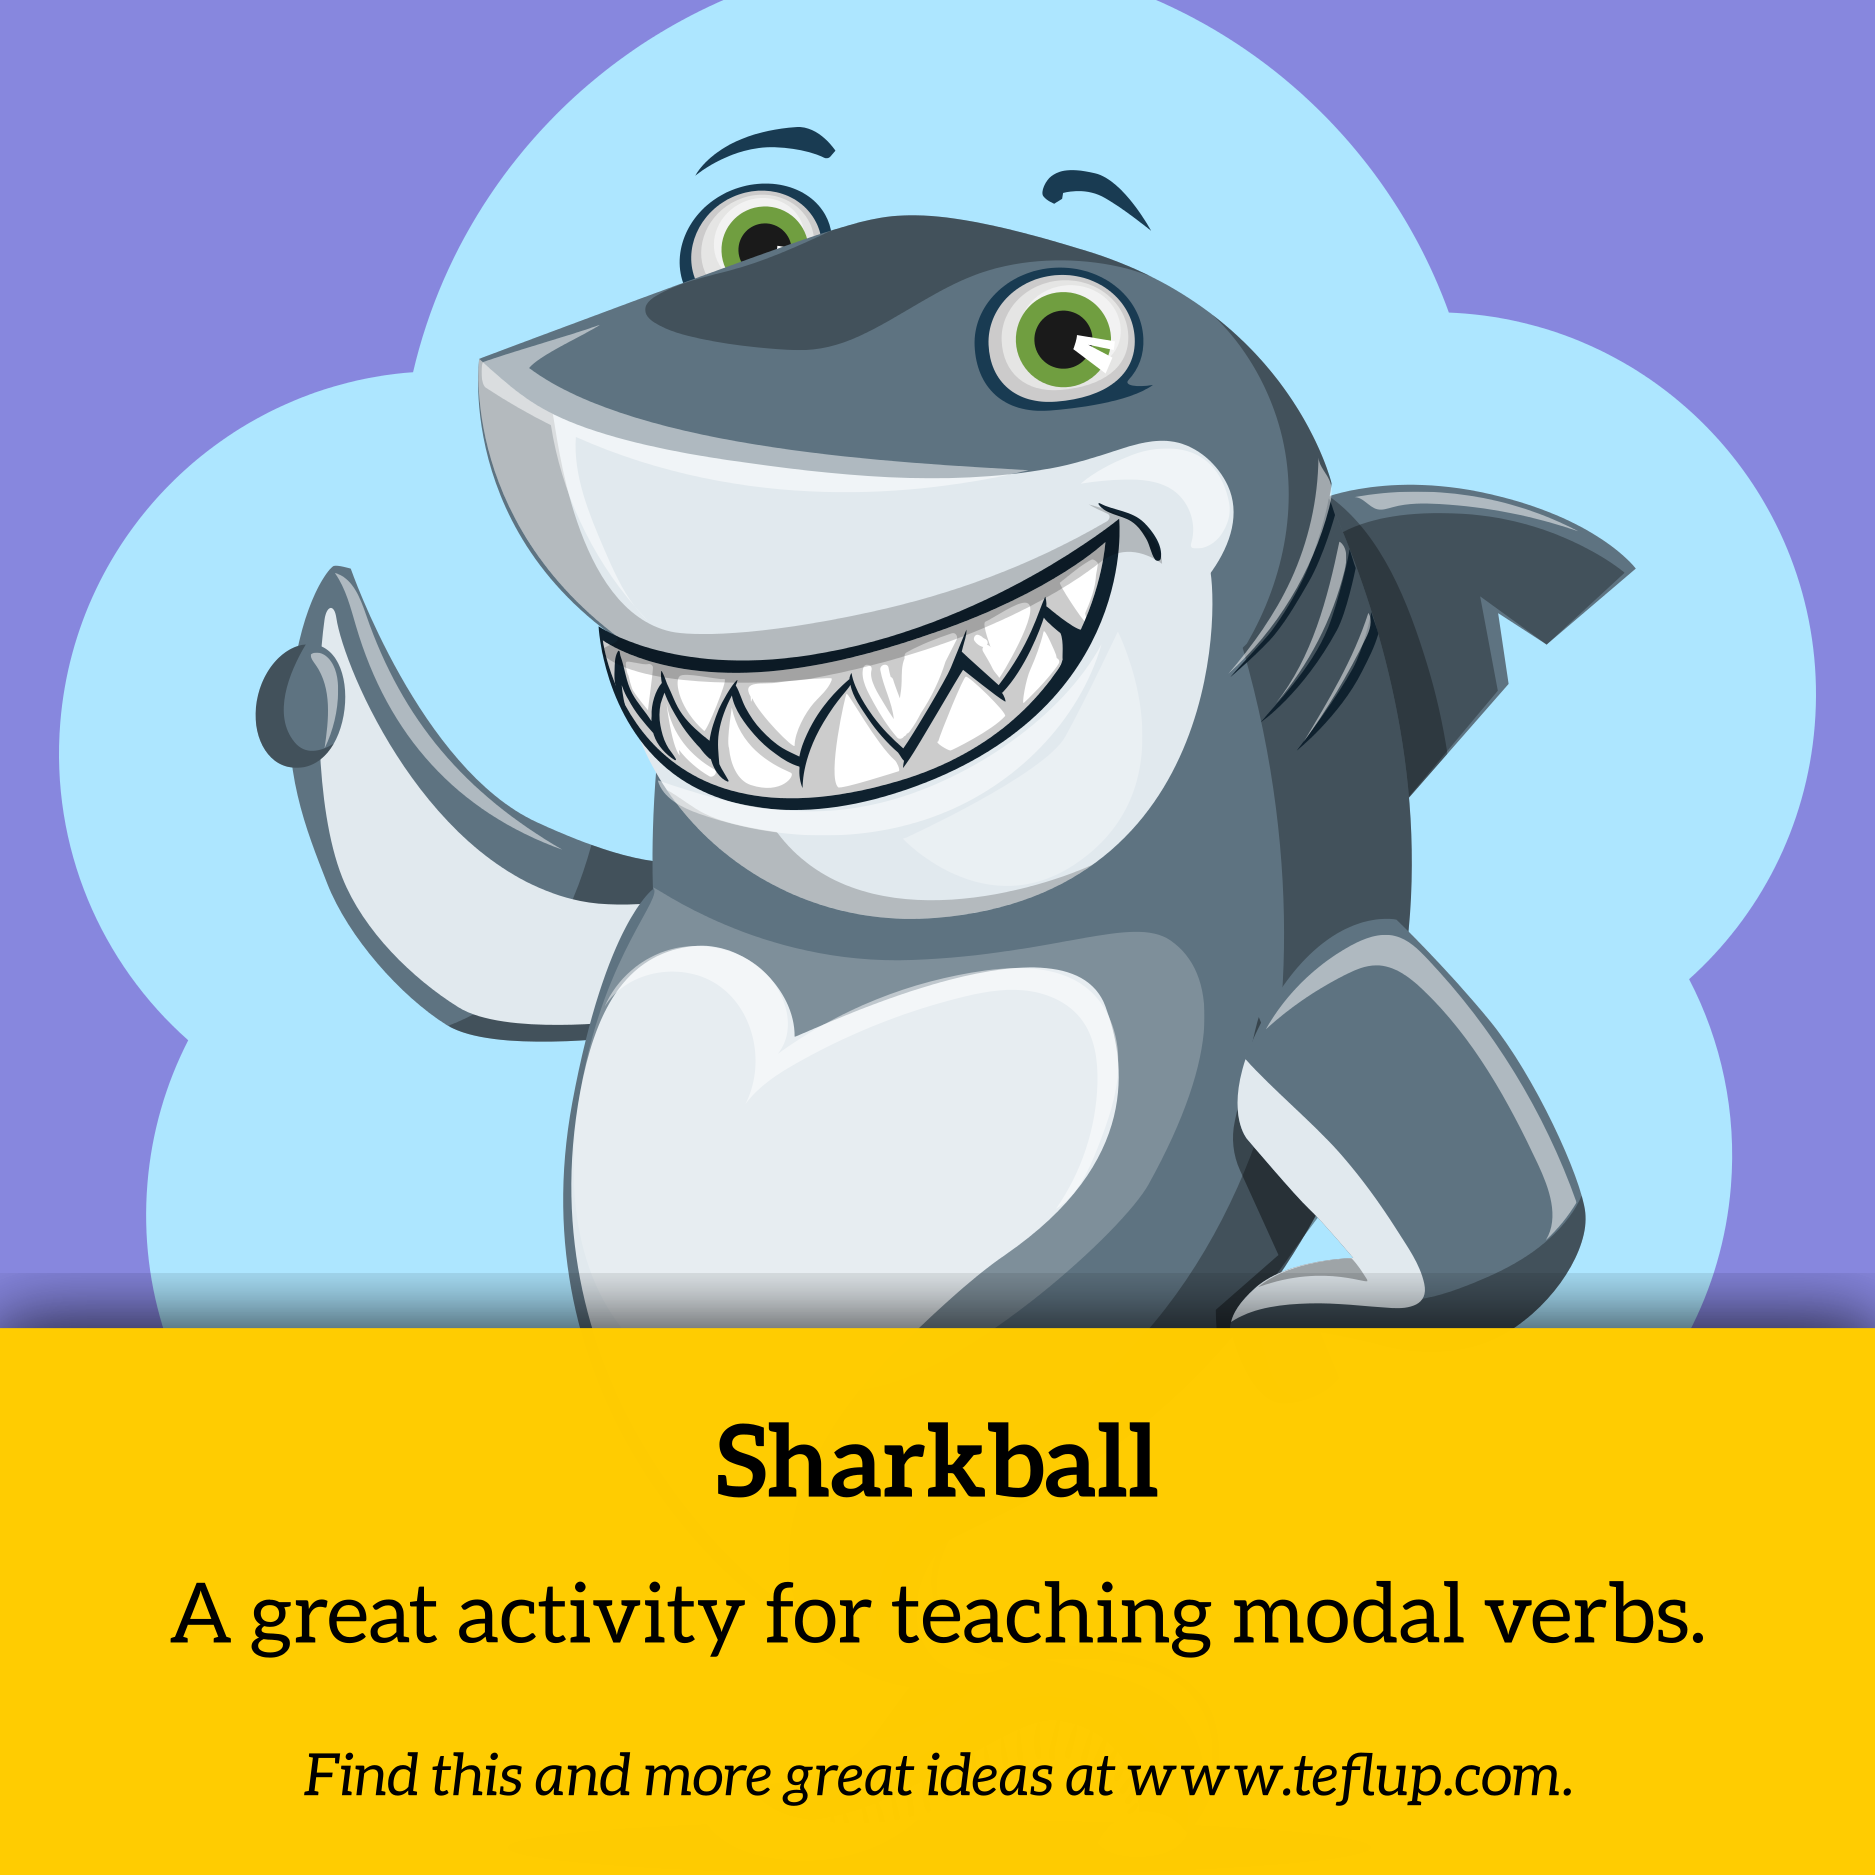 sharkball